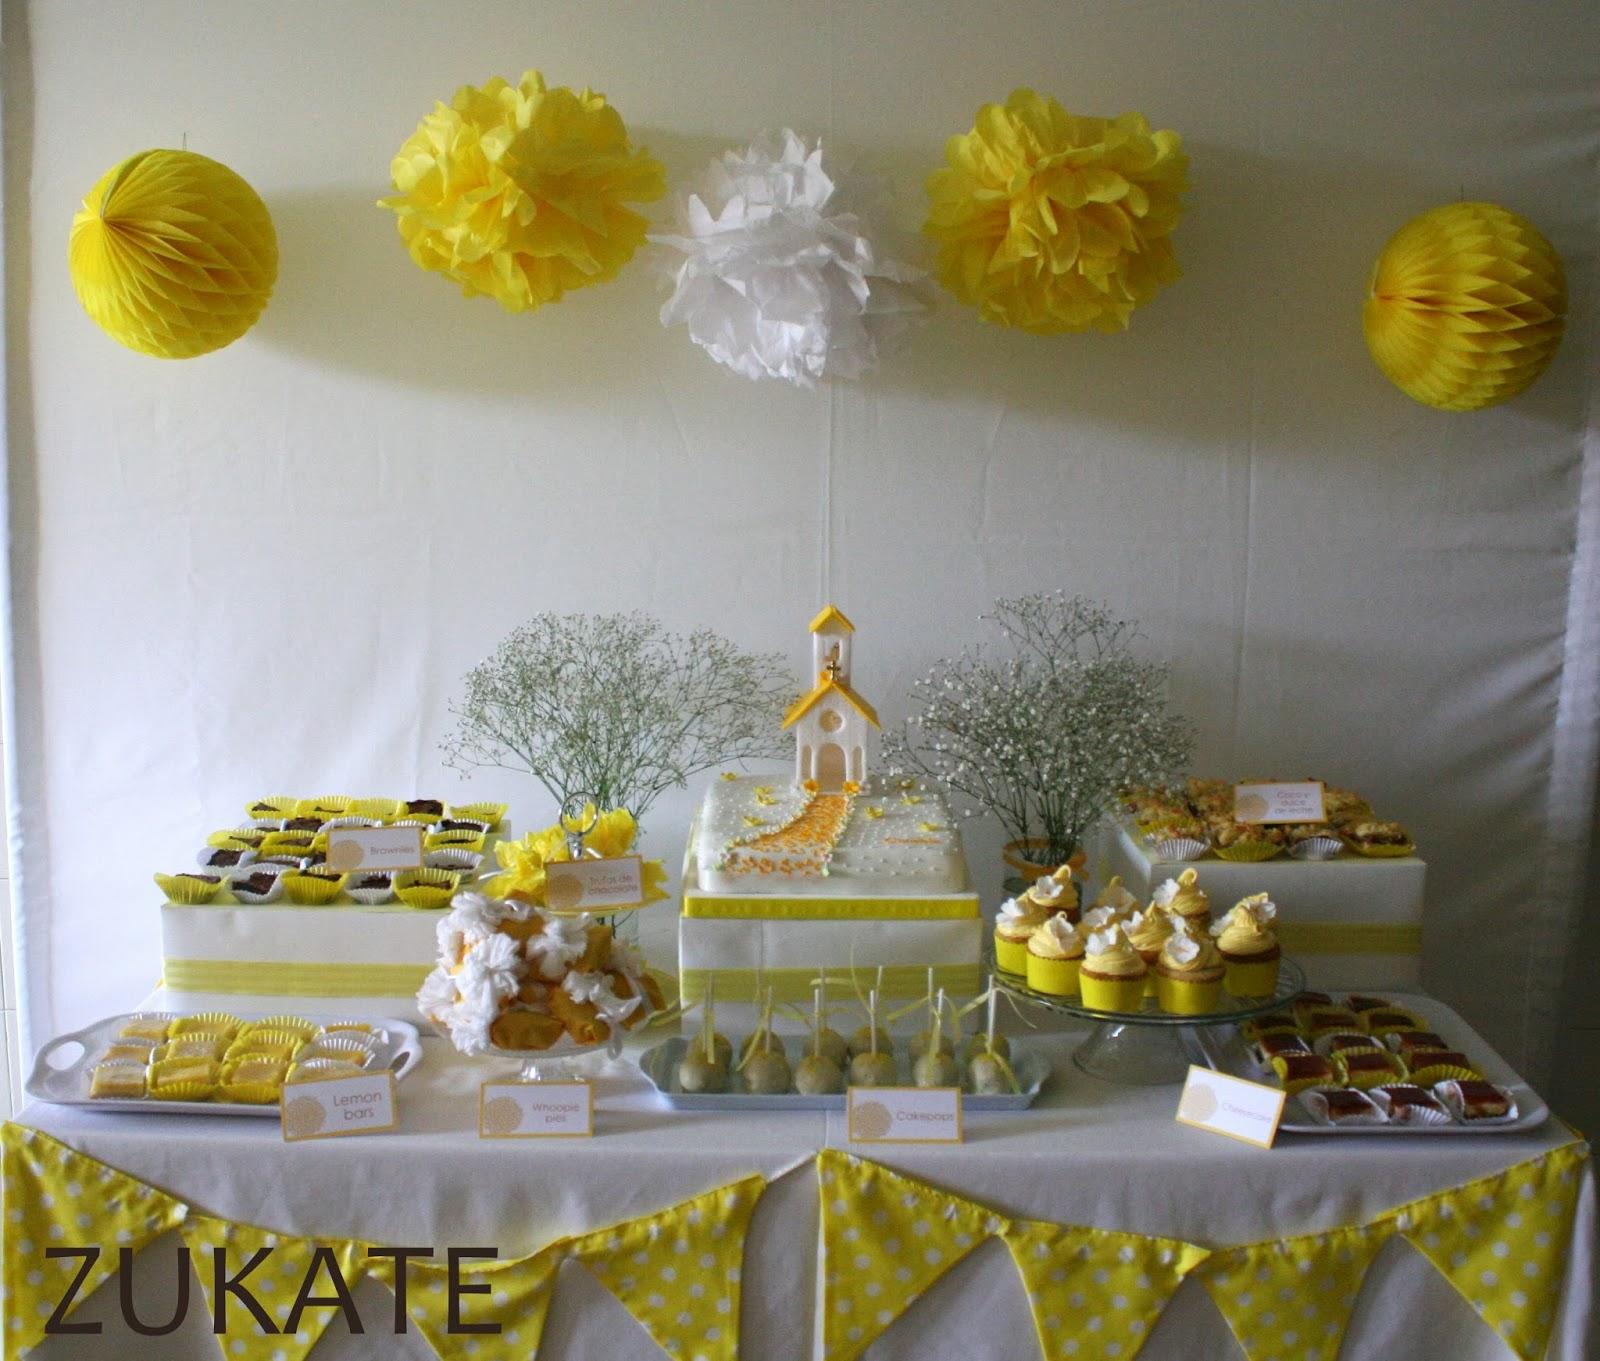 Fiesta de primera comuni n para cande zukate - Como decorar una lapida ...